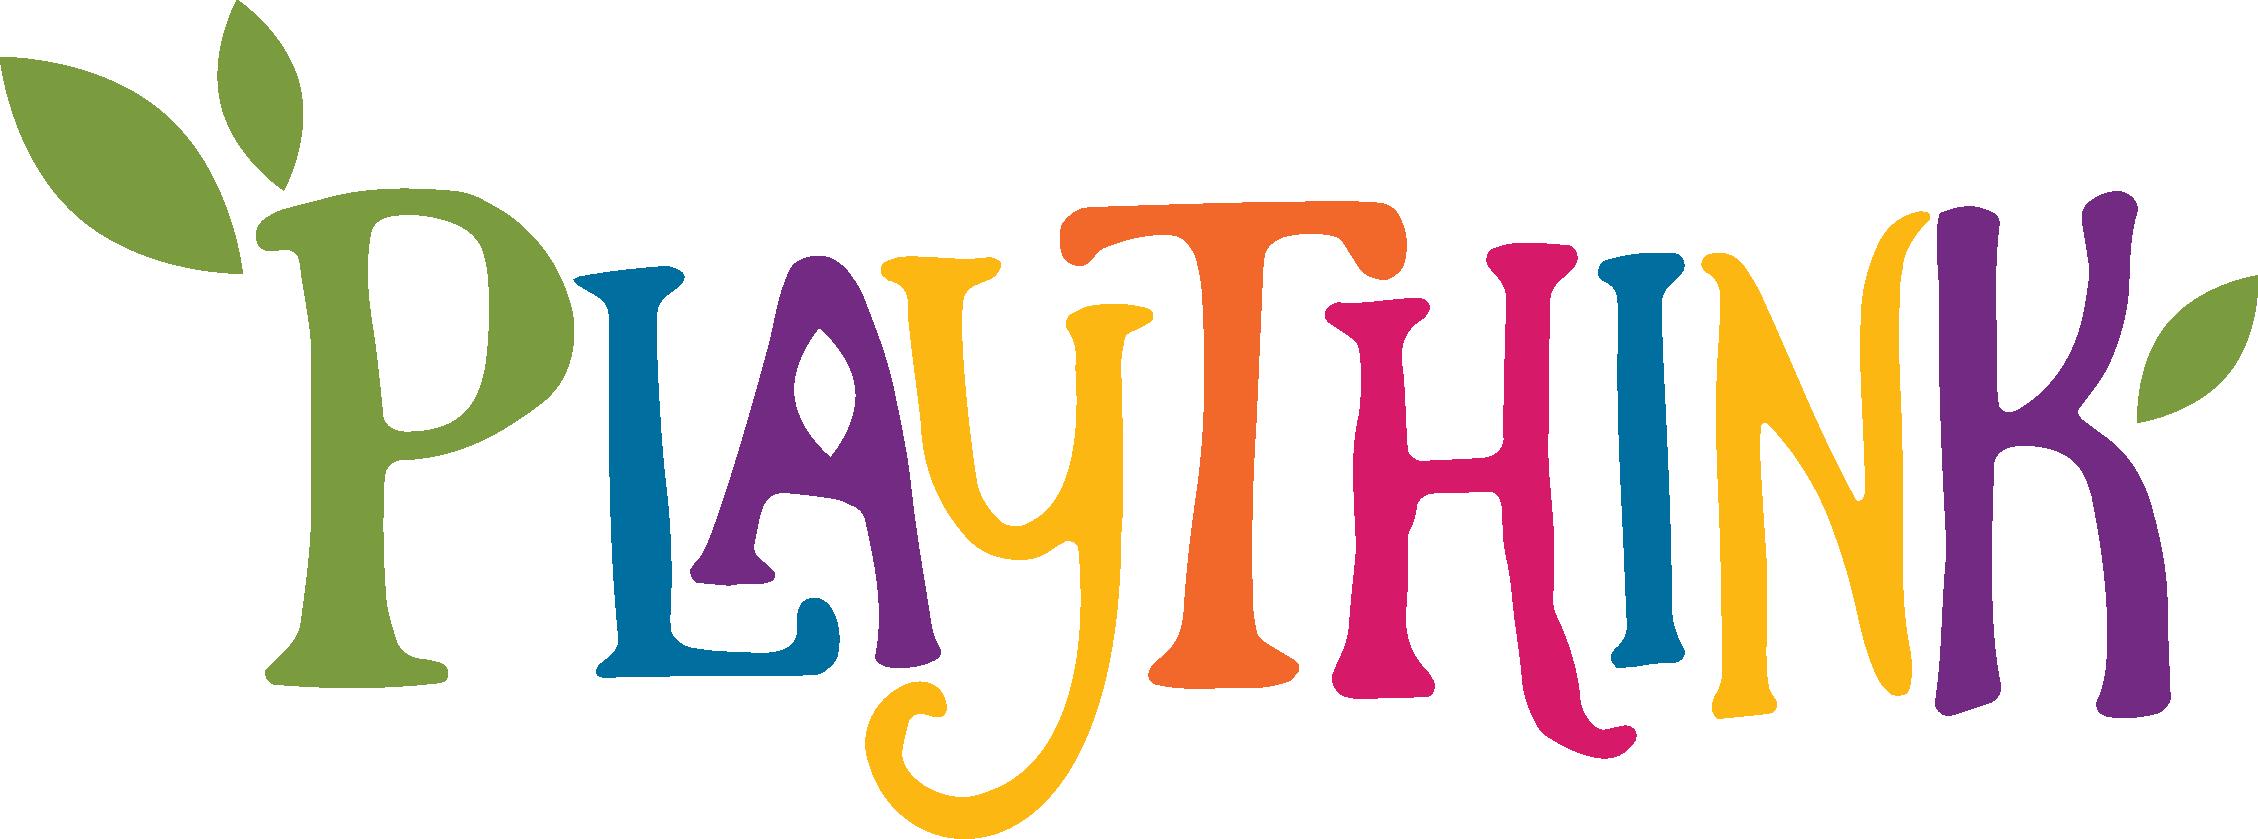 PlayThink | Movement, Art, Music